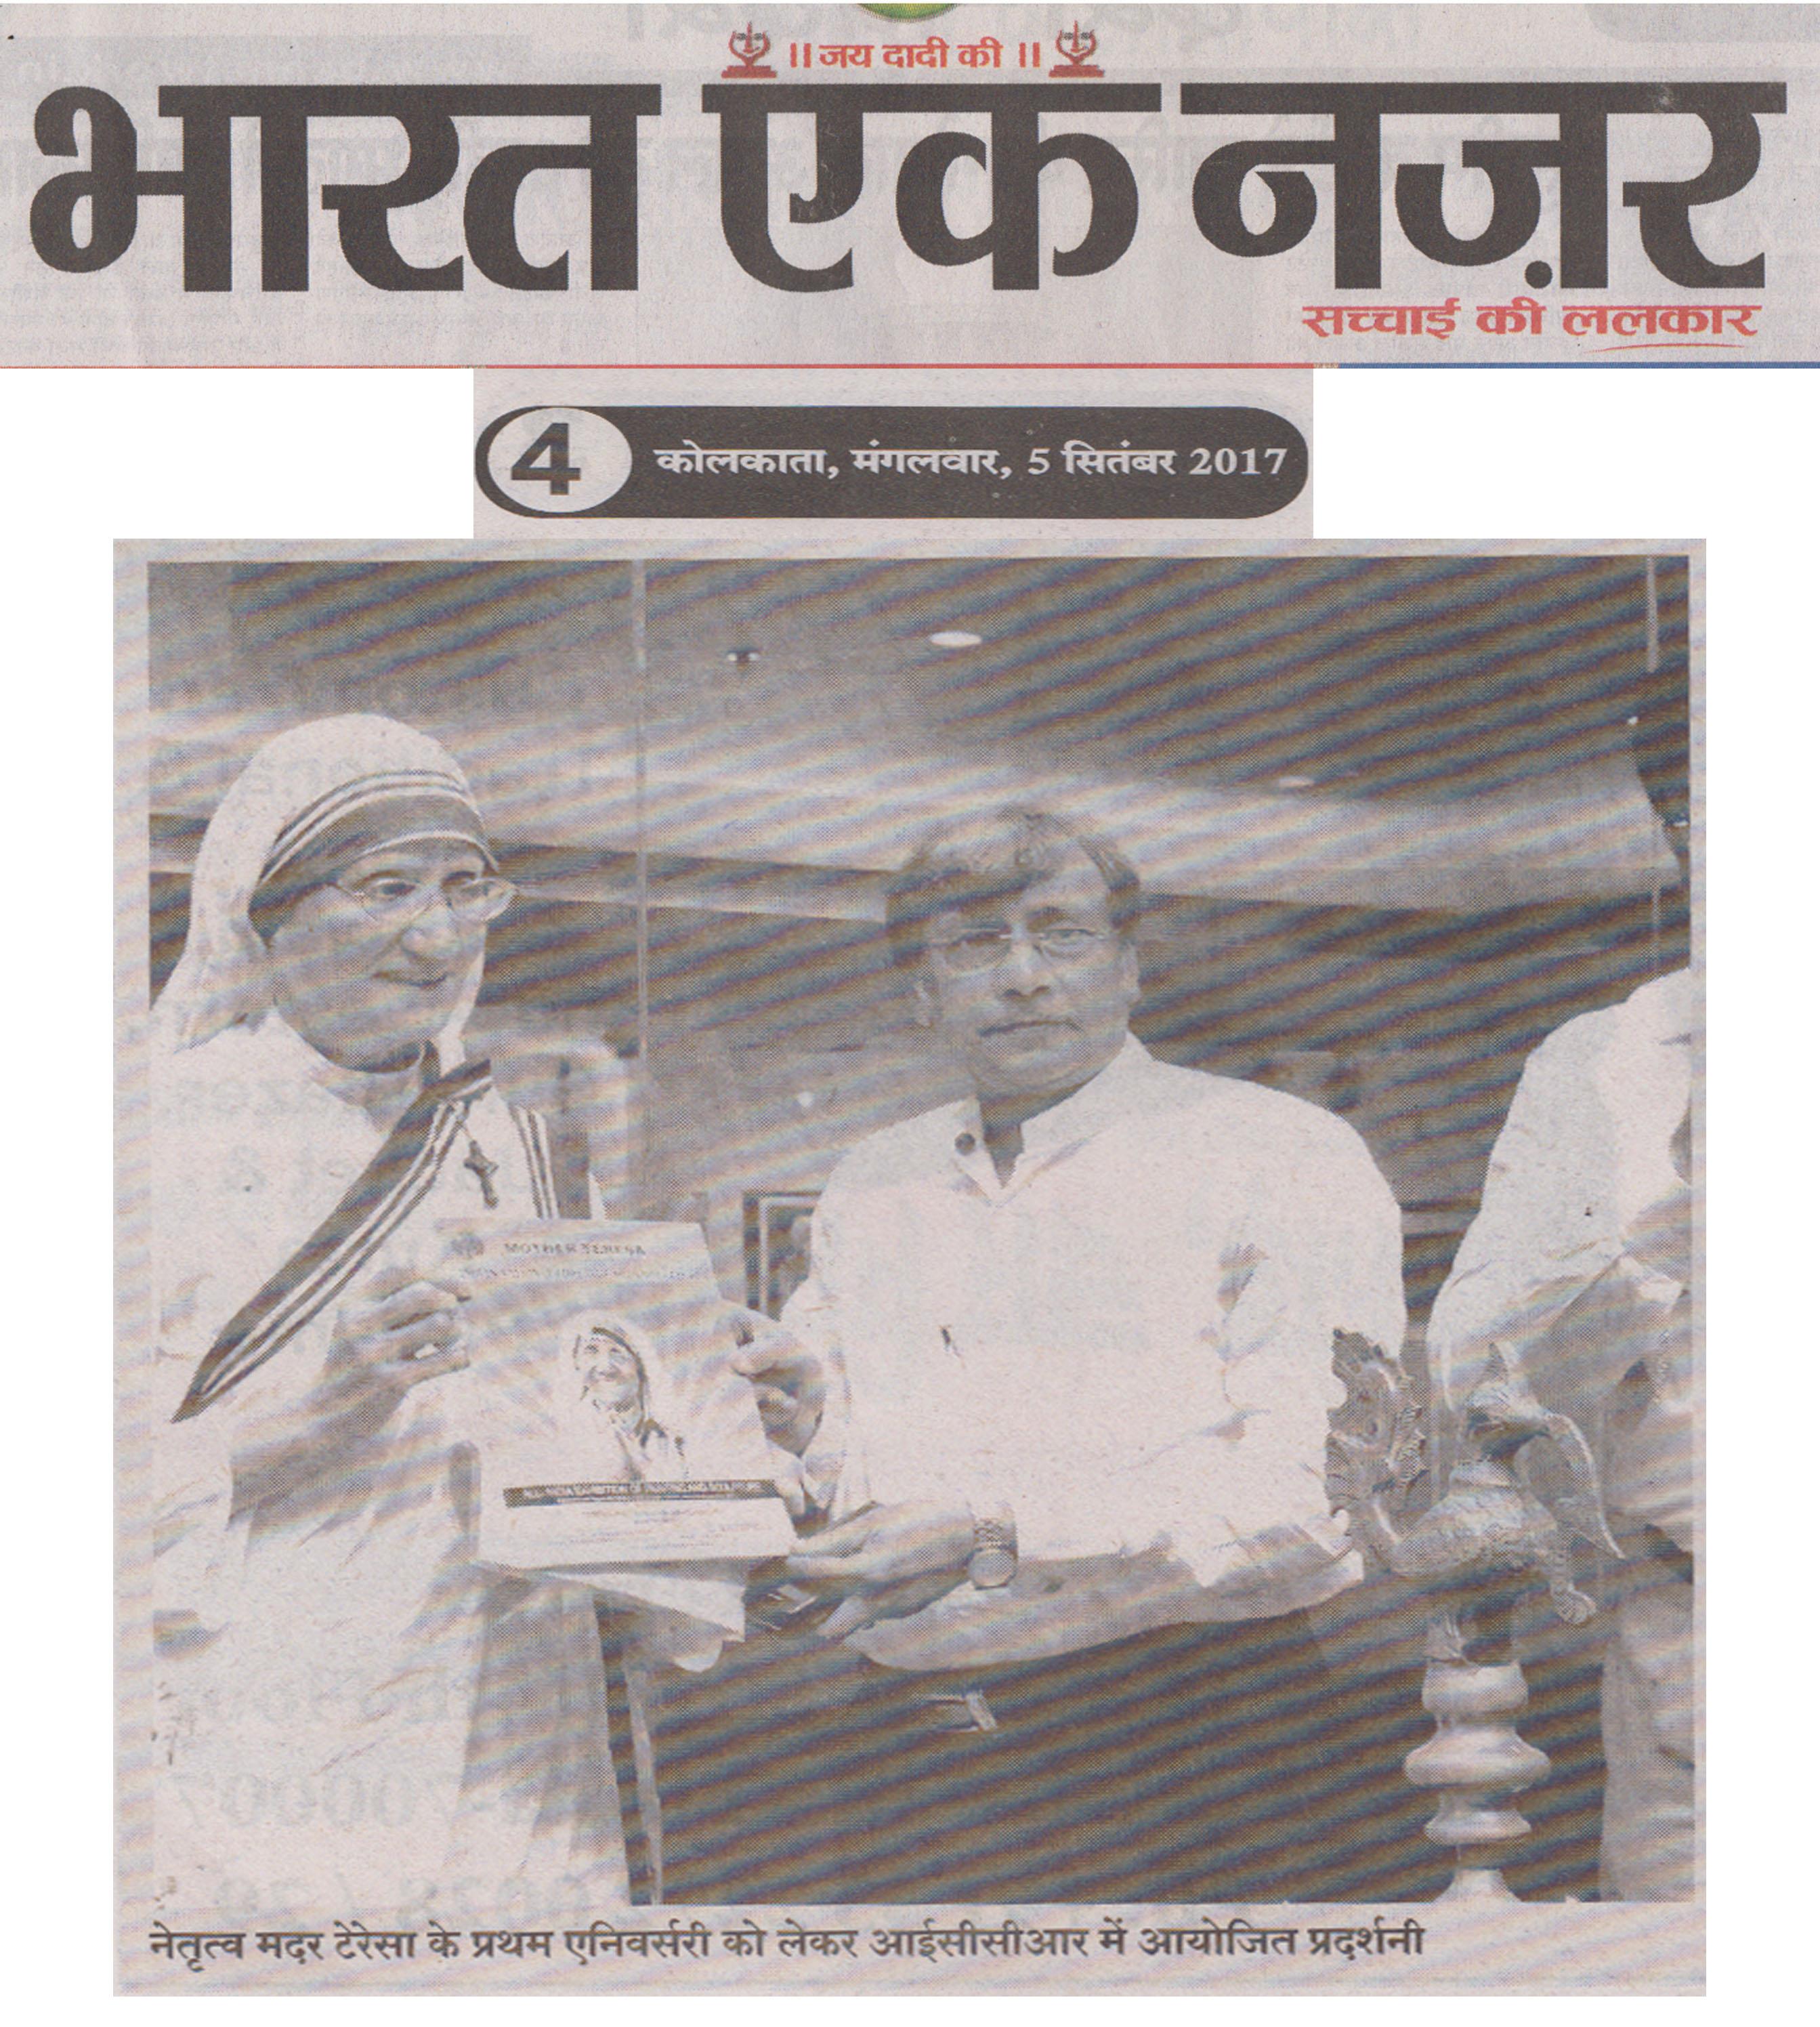 Mother Teresa, Bharat Ek Najar, Page-4, Date-05.09